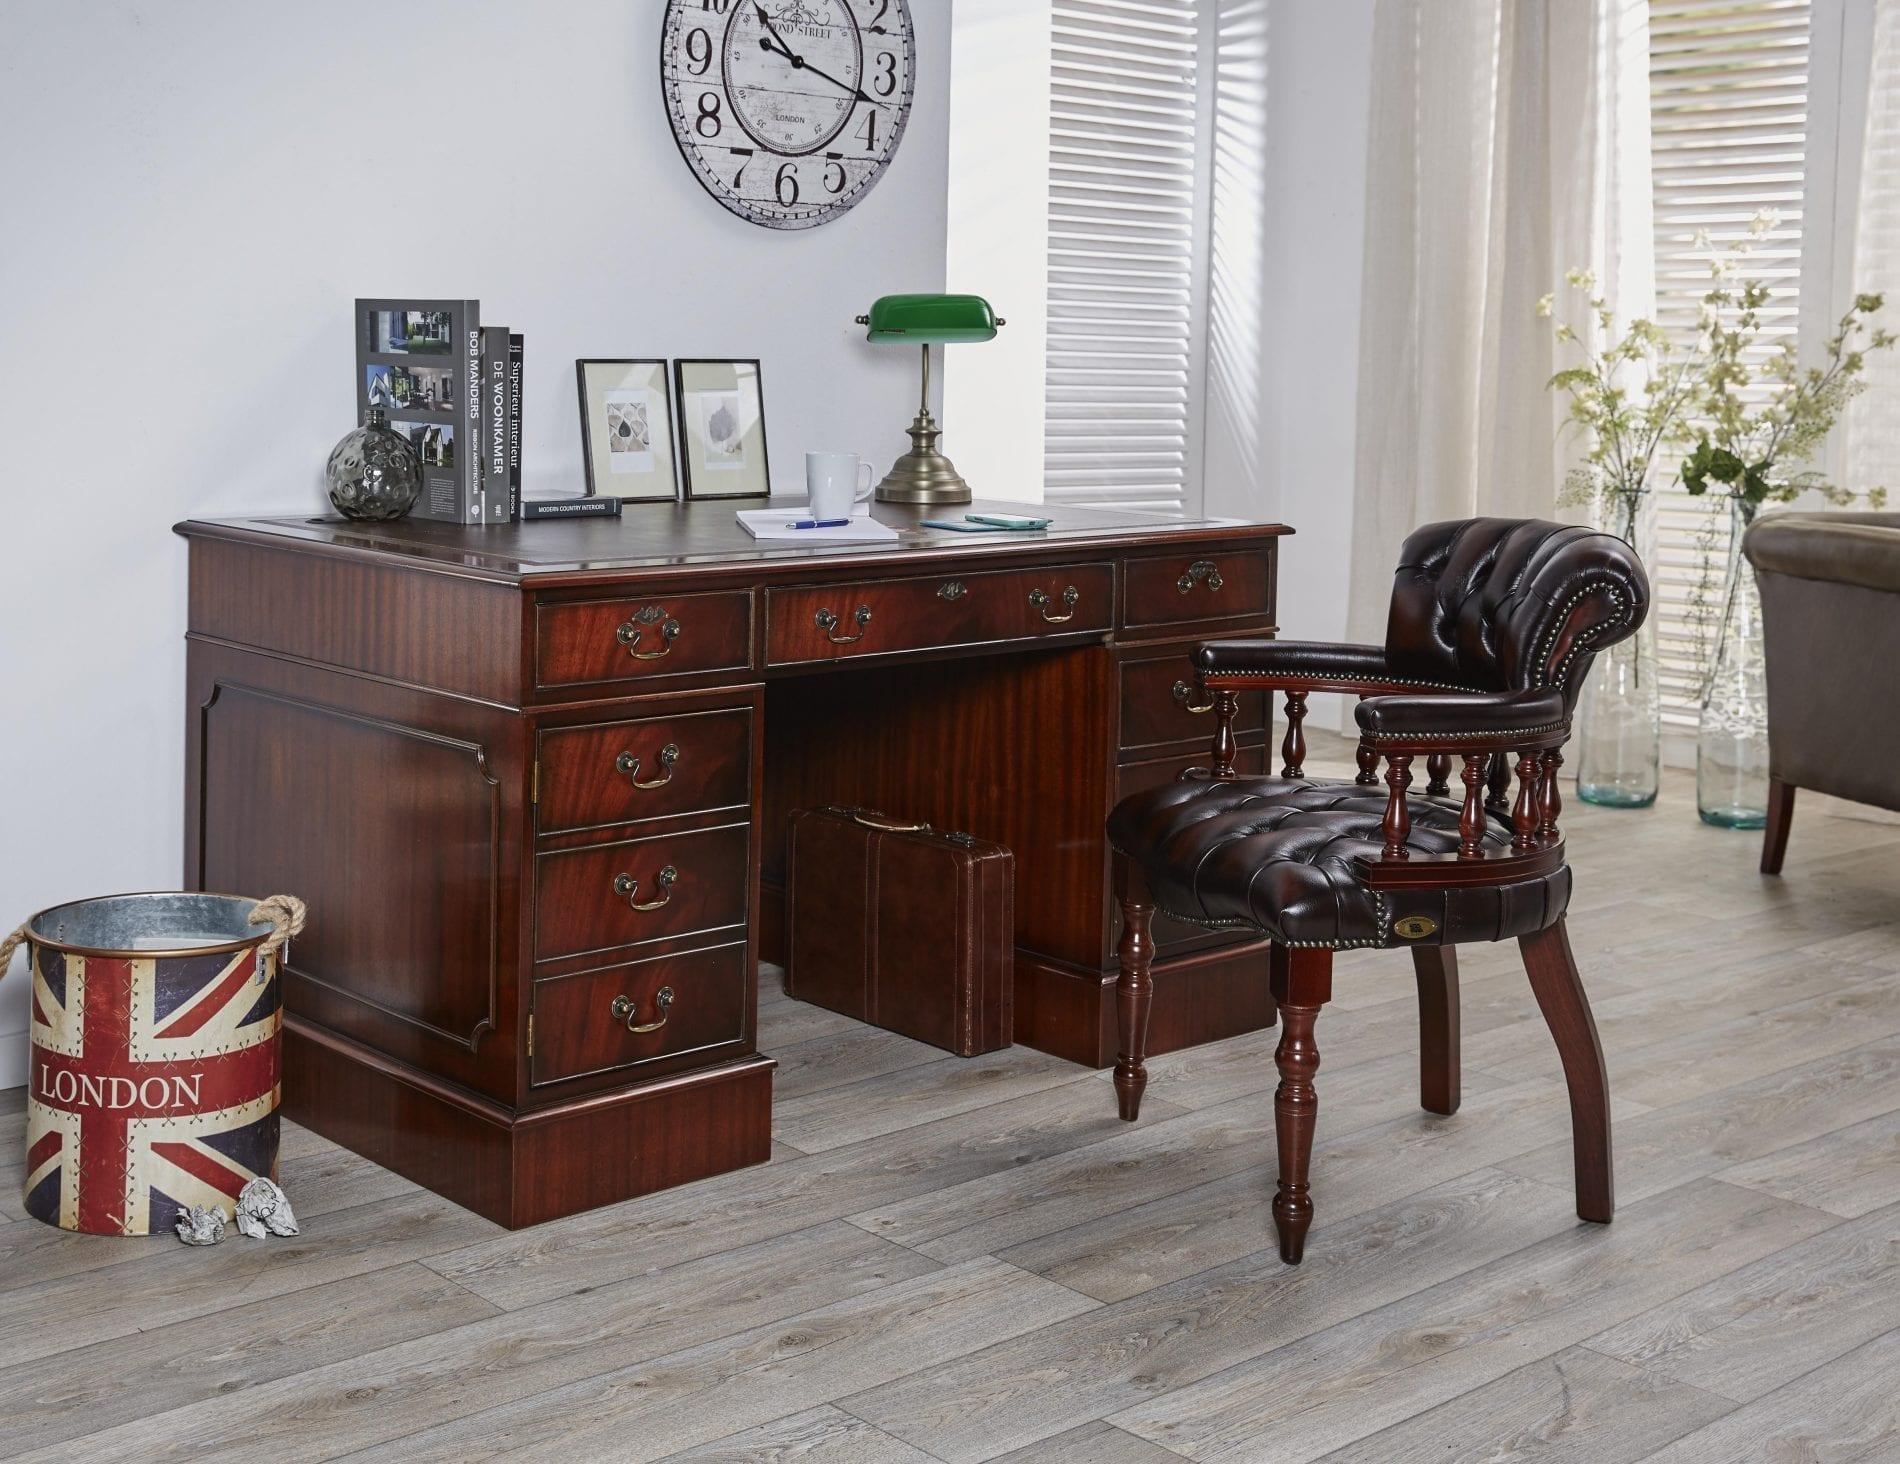 delta-chesterfield-bureau-en-captains-stand-chair-bureaustoel